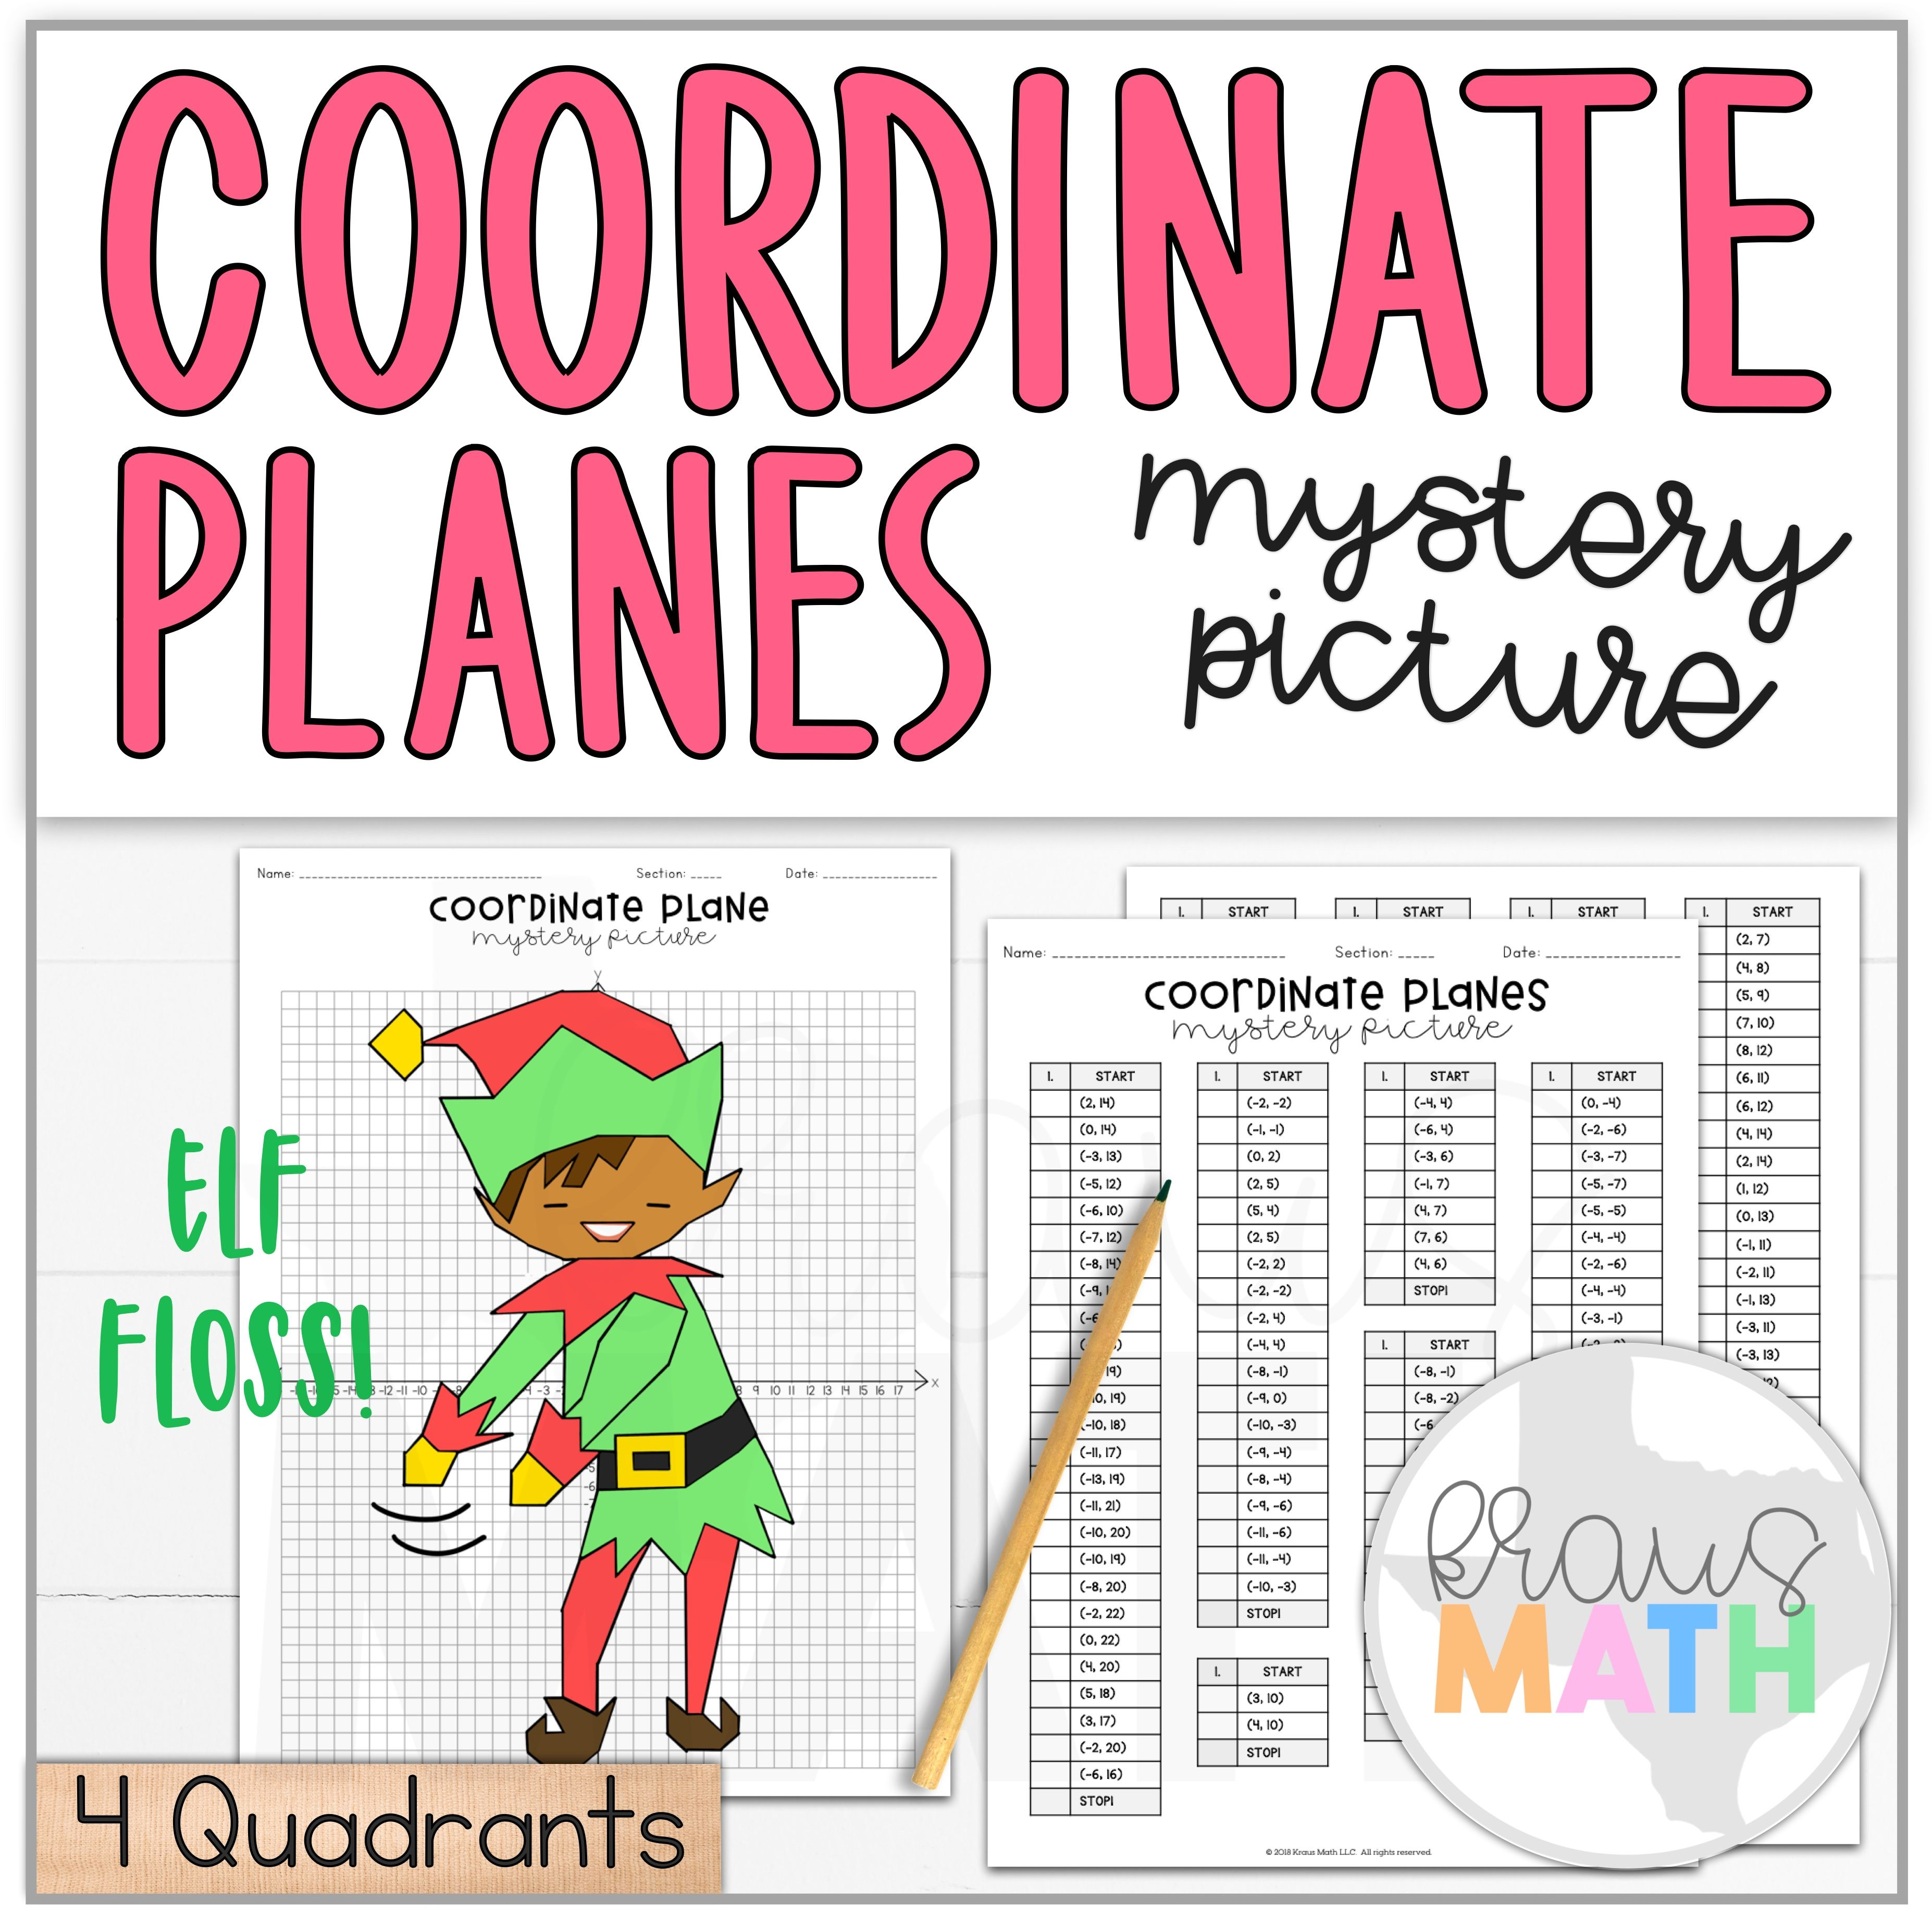 Elf Floss Dance Coordinate Plane Activity (4 Quadrants)   Kraus Math * Christmas/Winter Activity…   Coordinate plane activity [ 3692 x 3708 Pixel ]